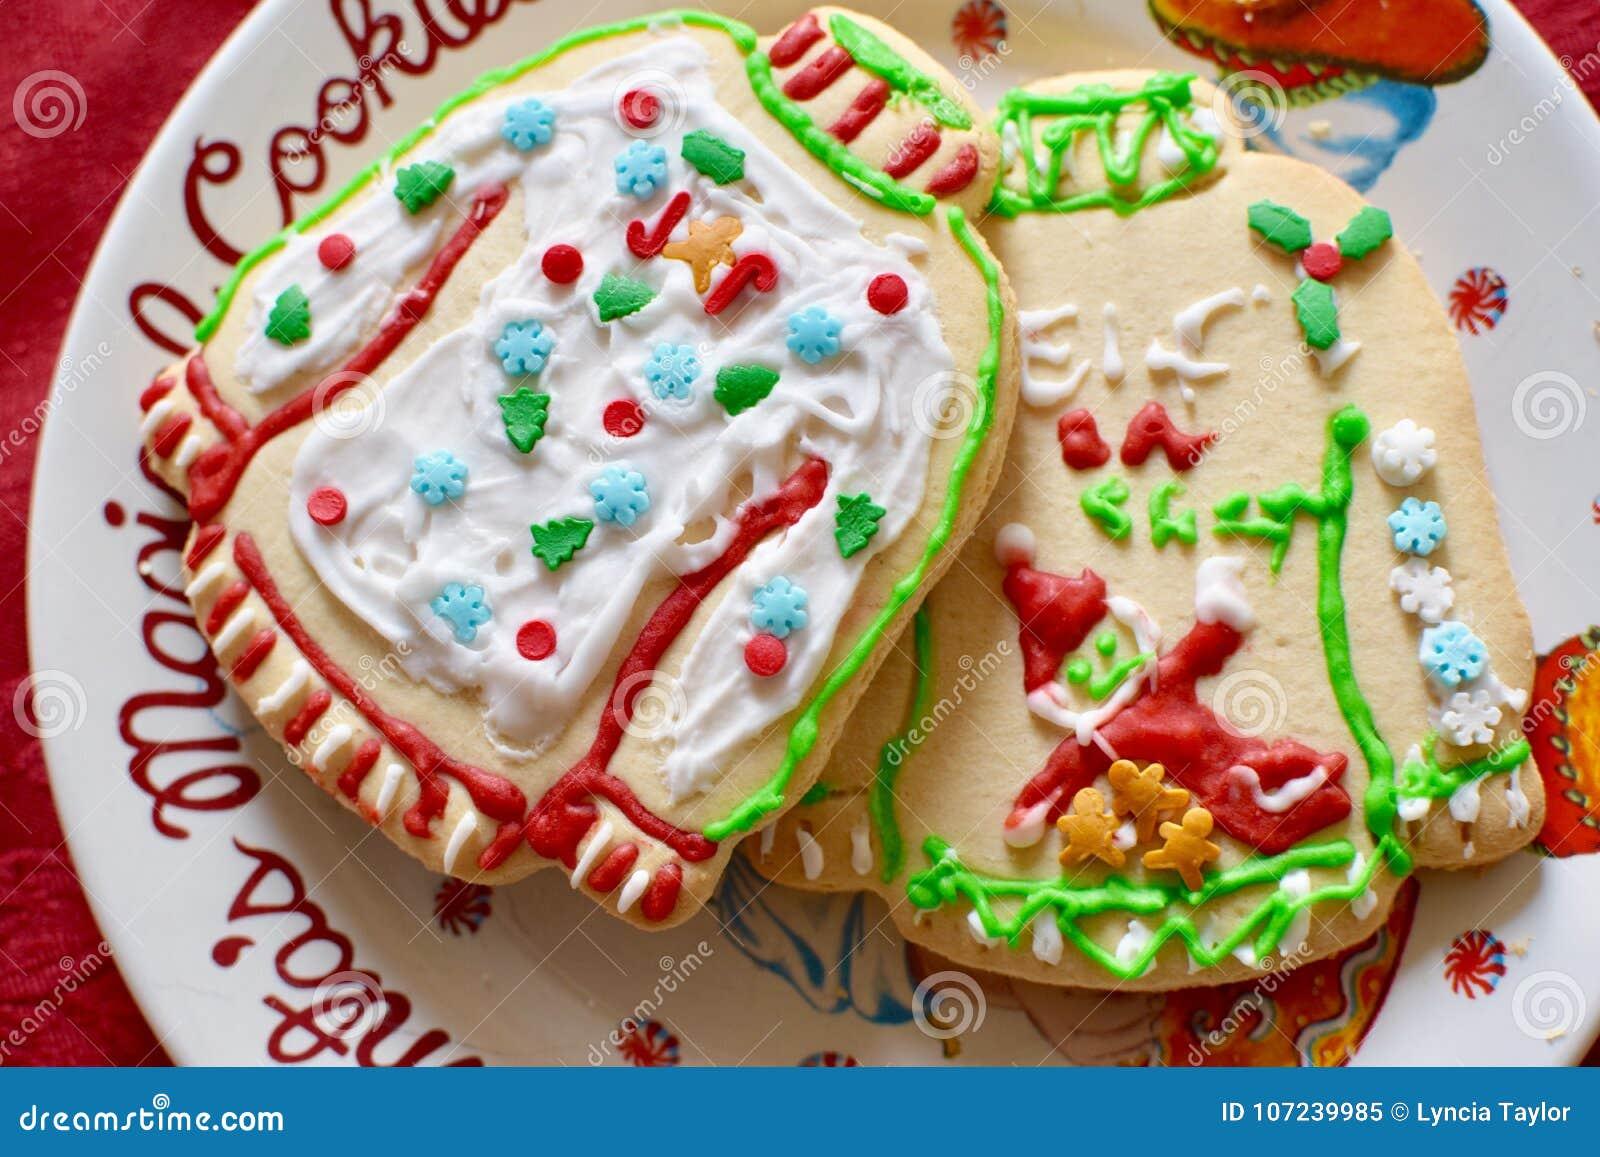 Christmas Cookies Stock Image Image Of Cookies Christmas 107239985